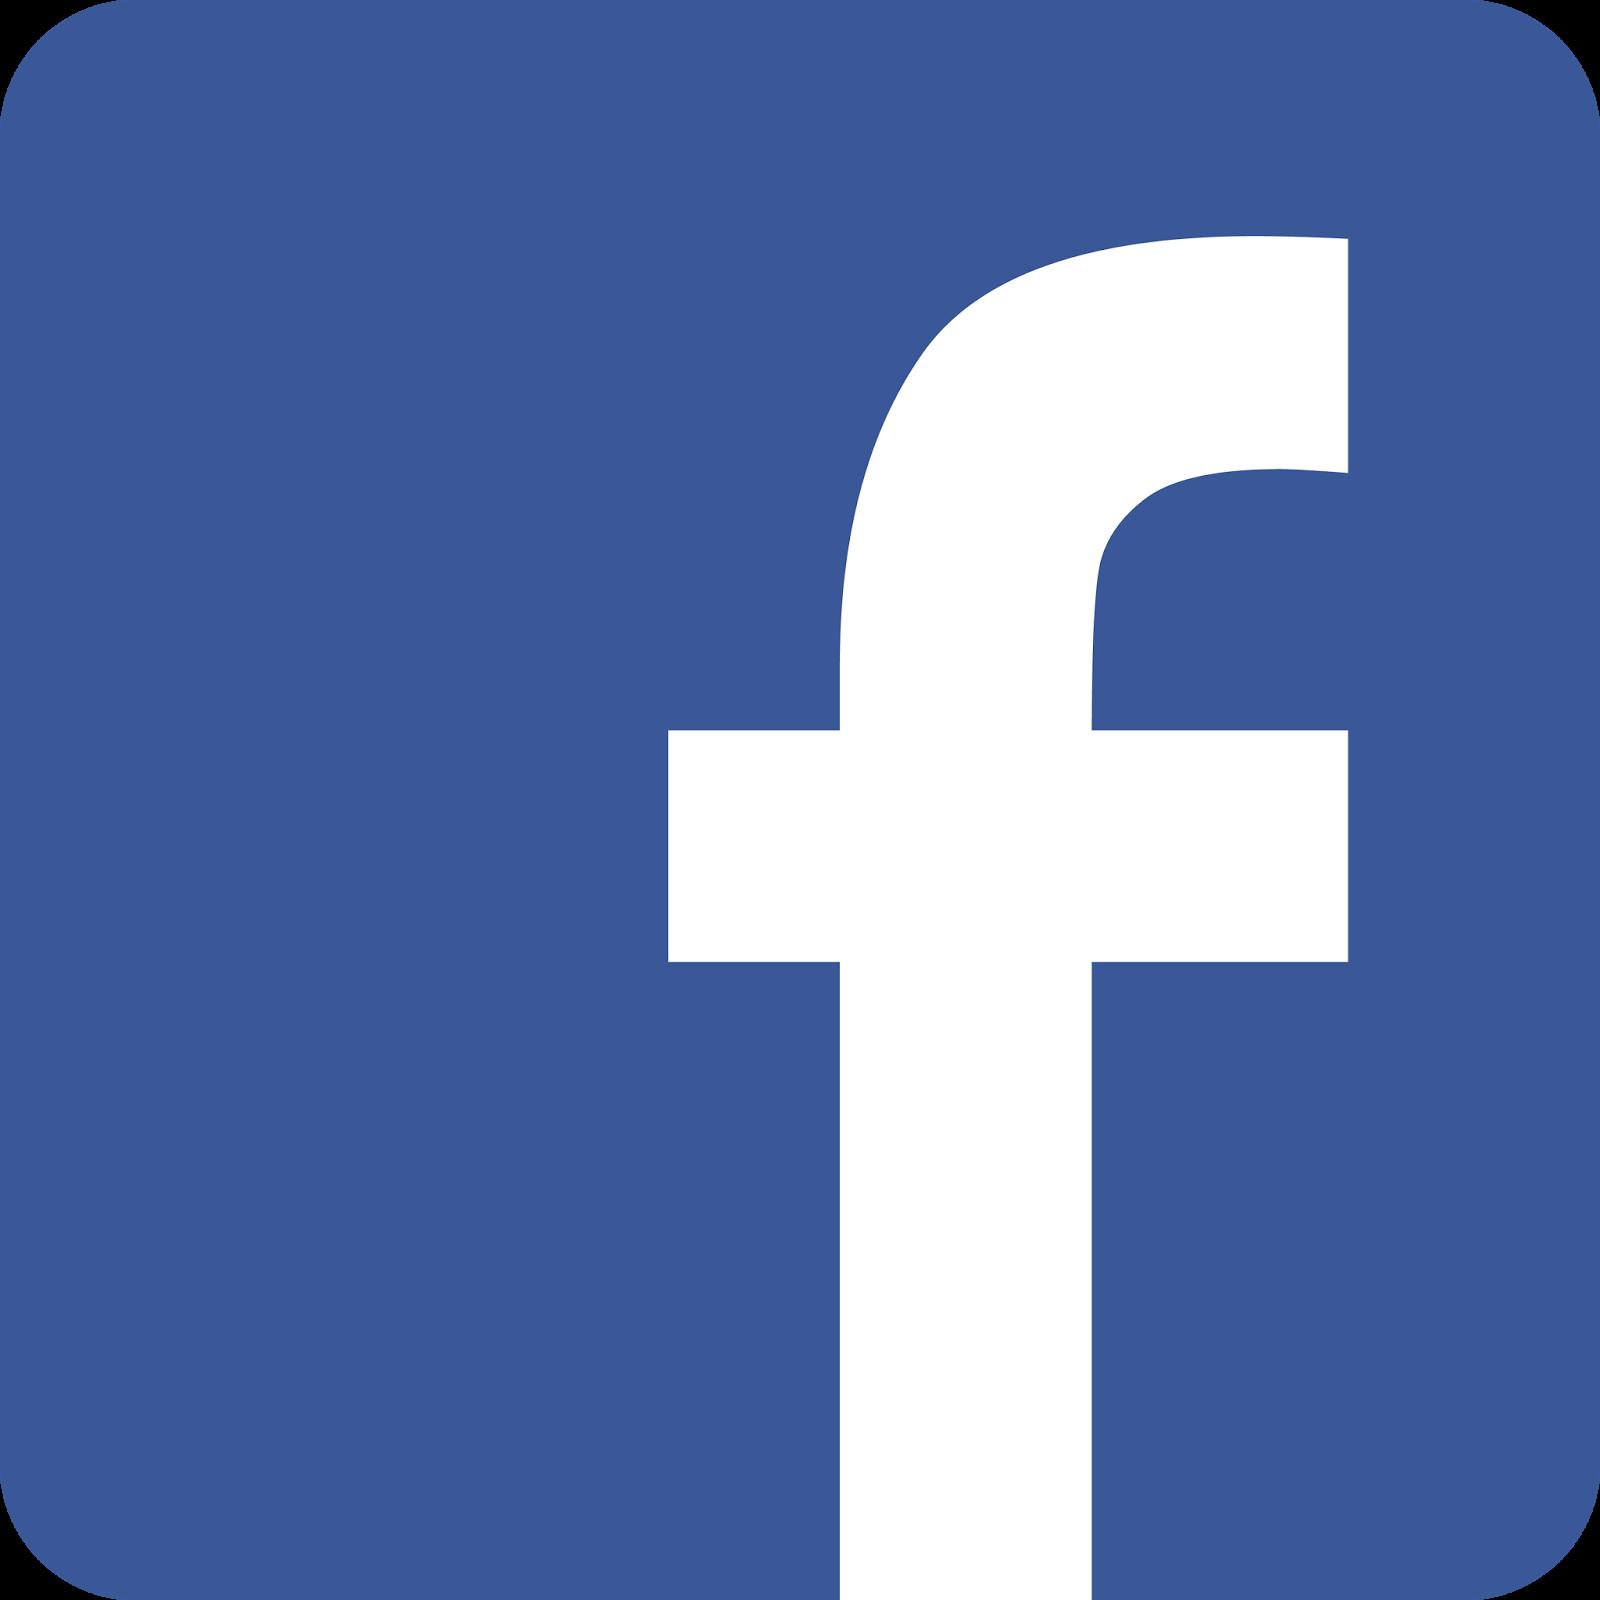 WEBIMAGES: FB.png